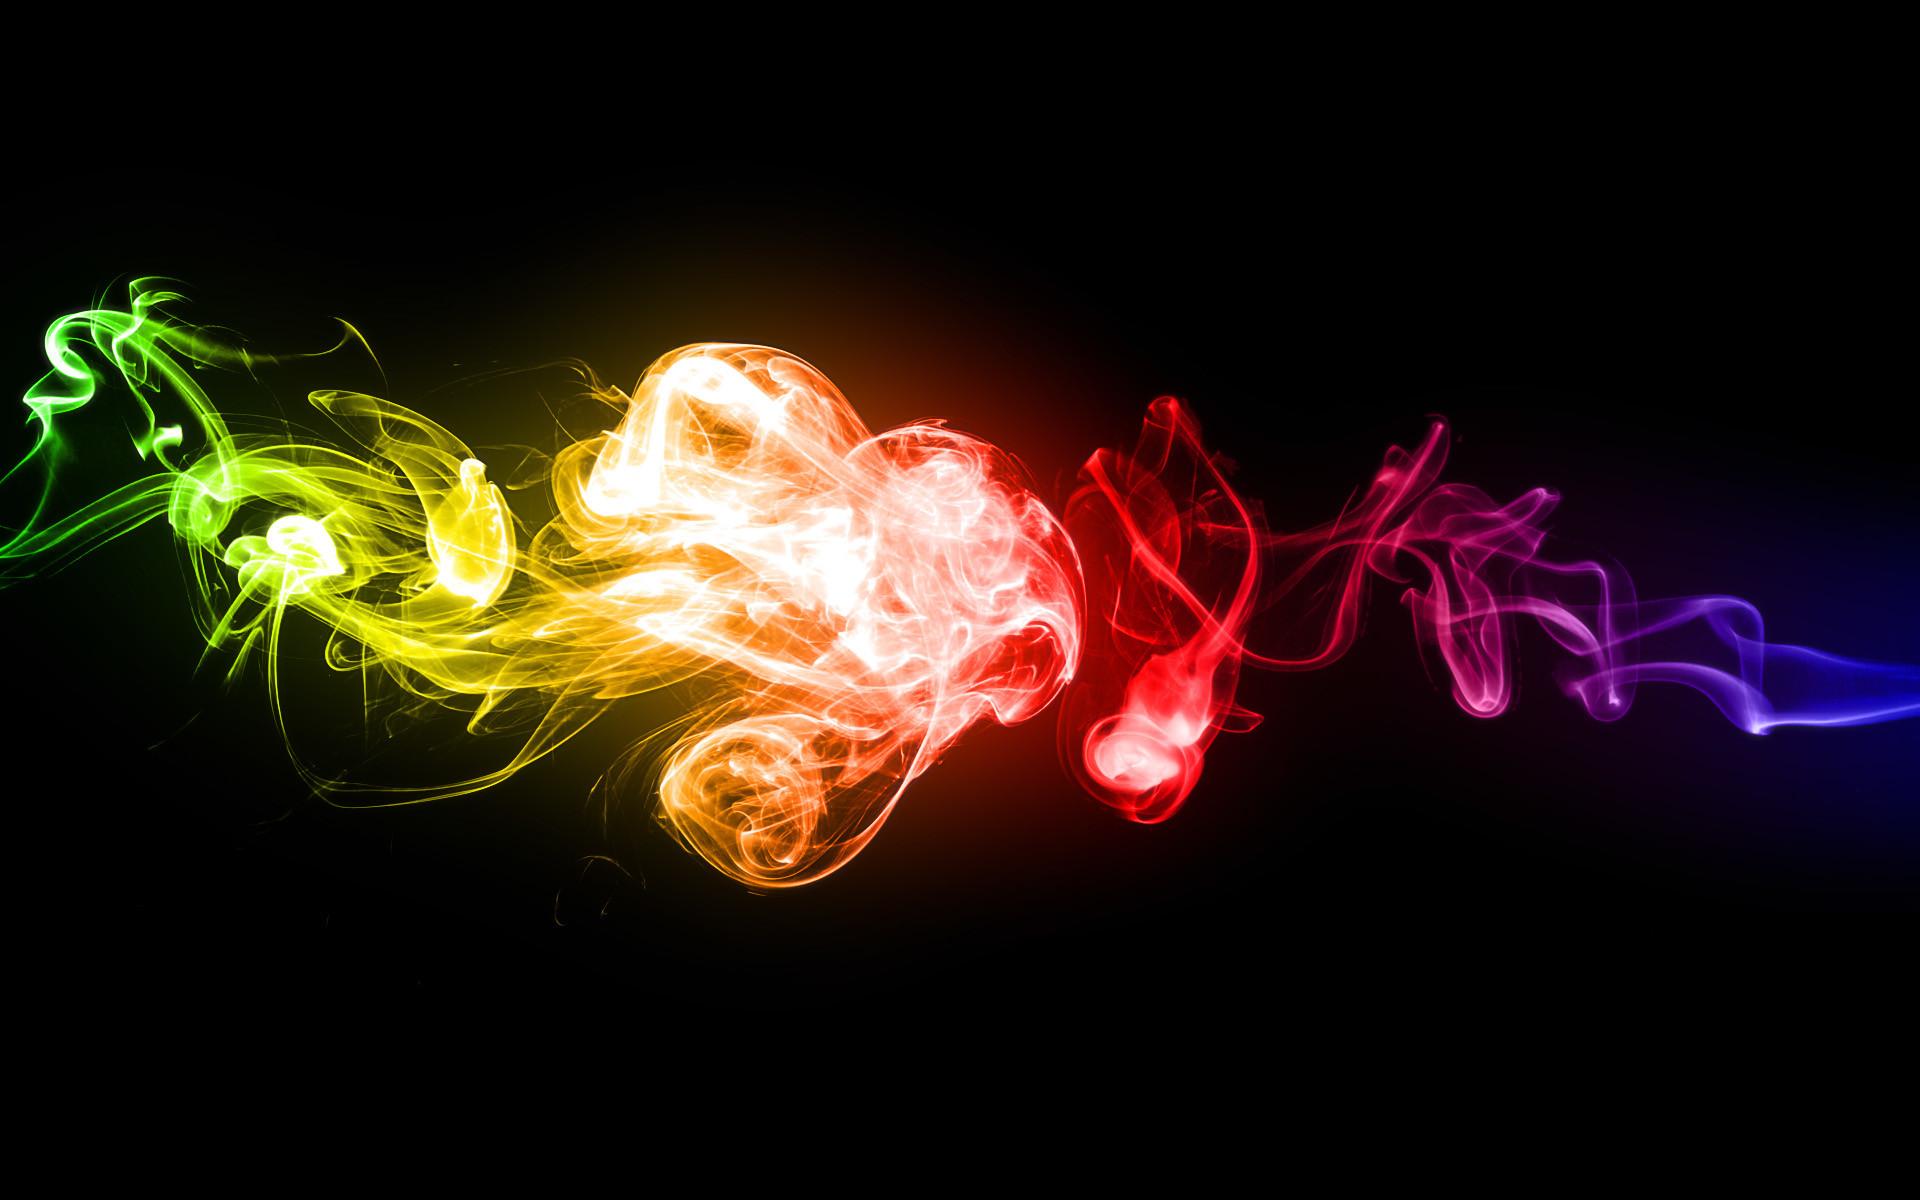 Magic Smoke Wallpapers (67+ images)